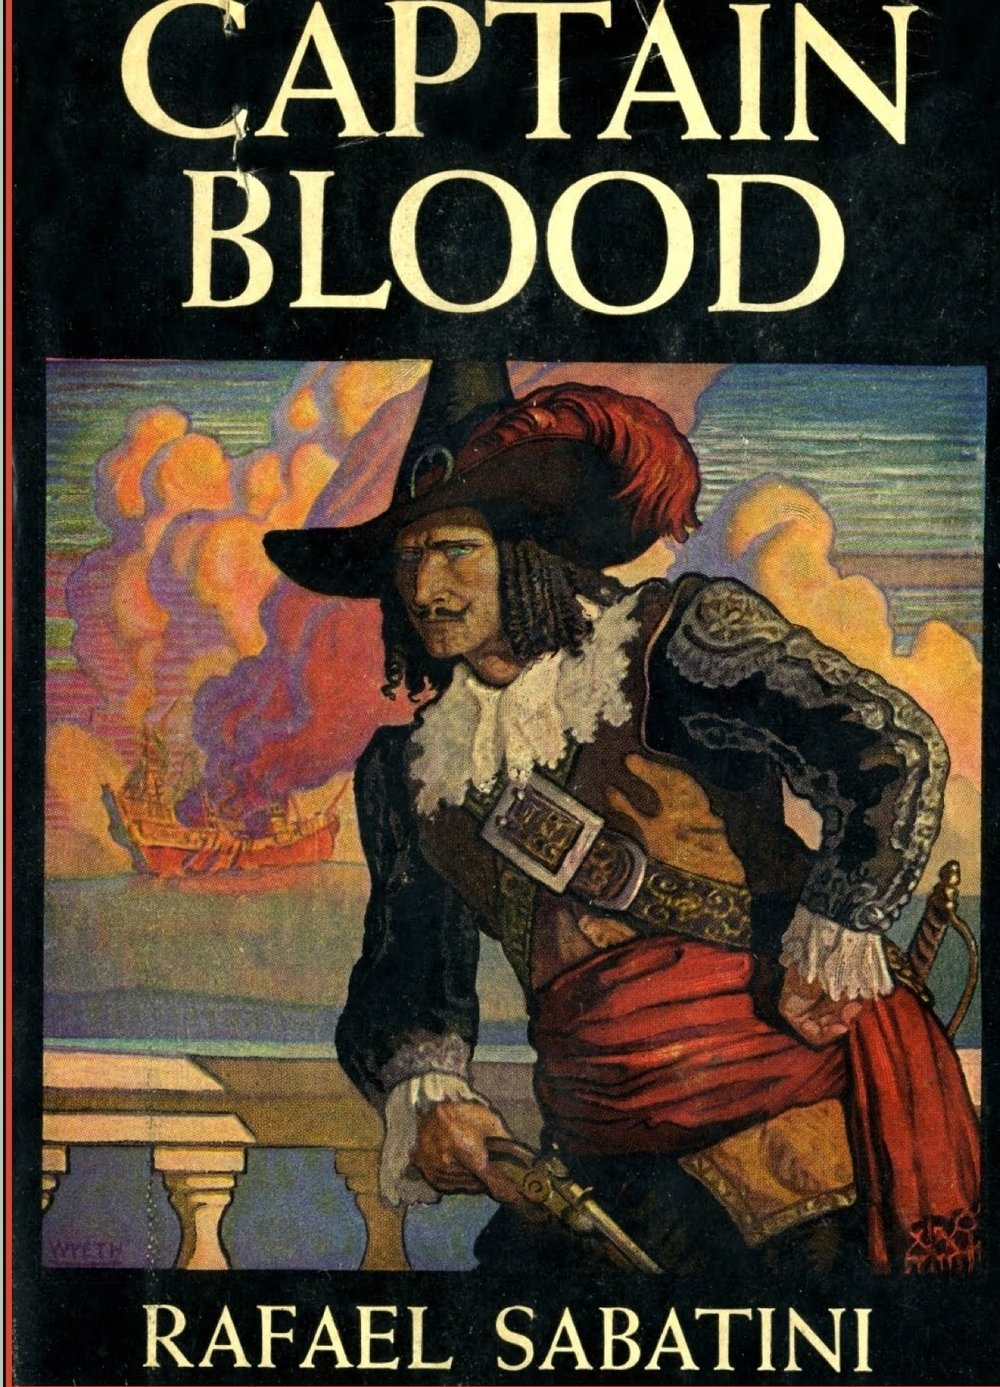 sab-blood1.jpg